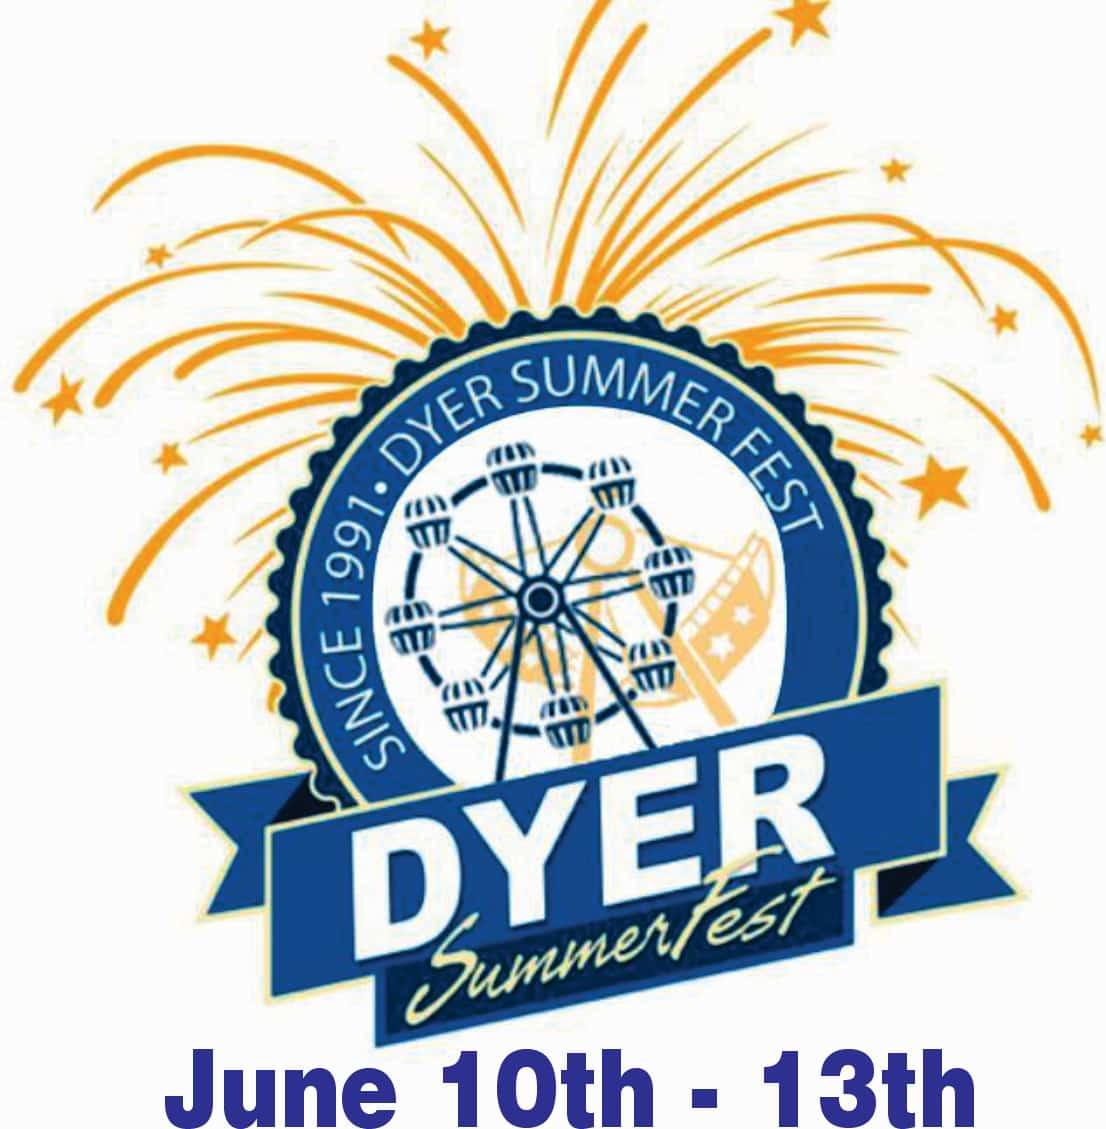 dyer summerfest 2021